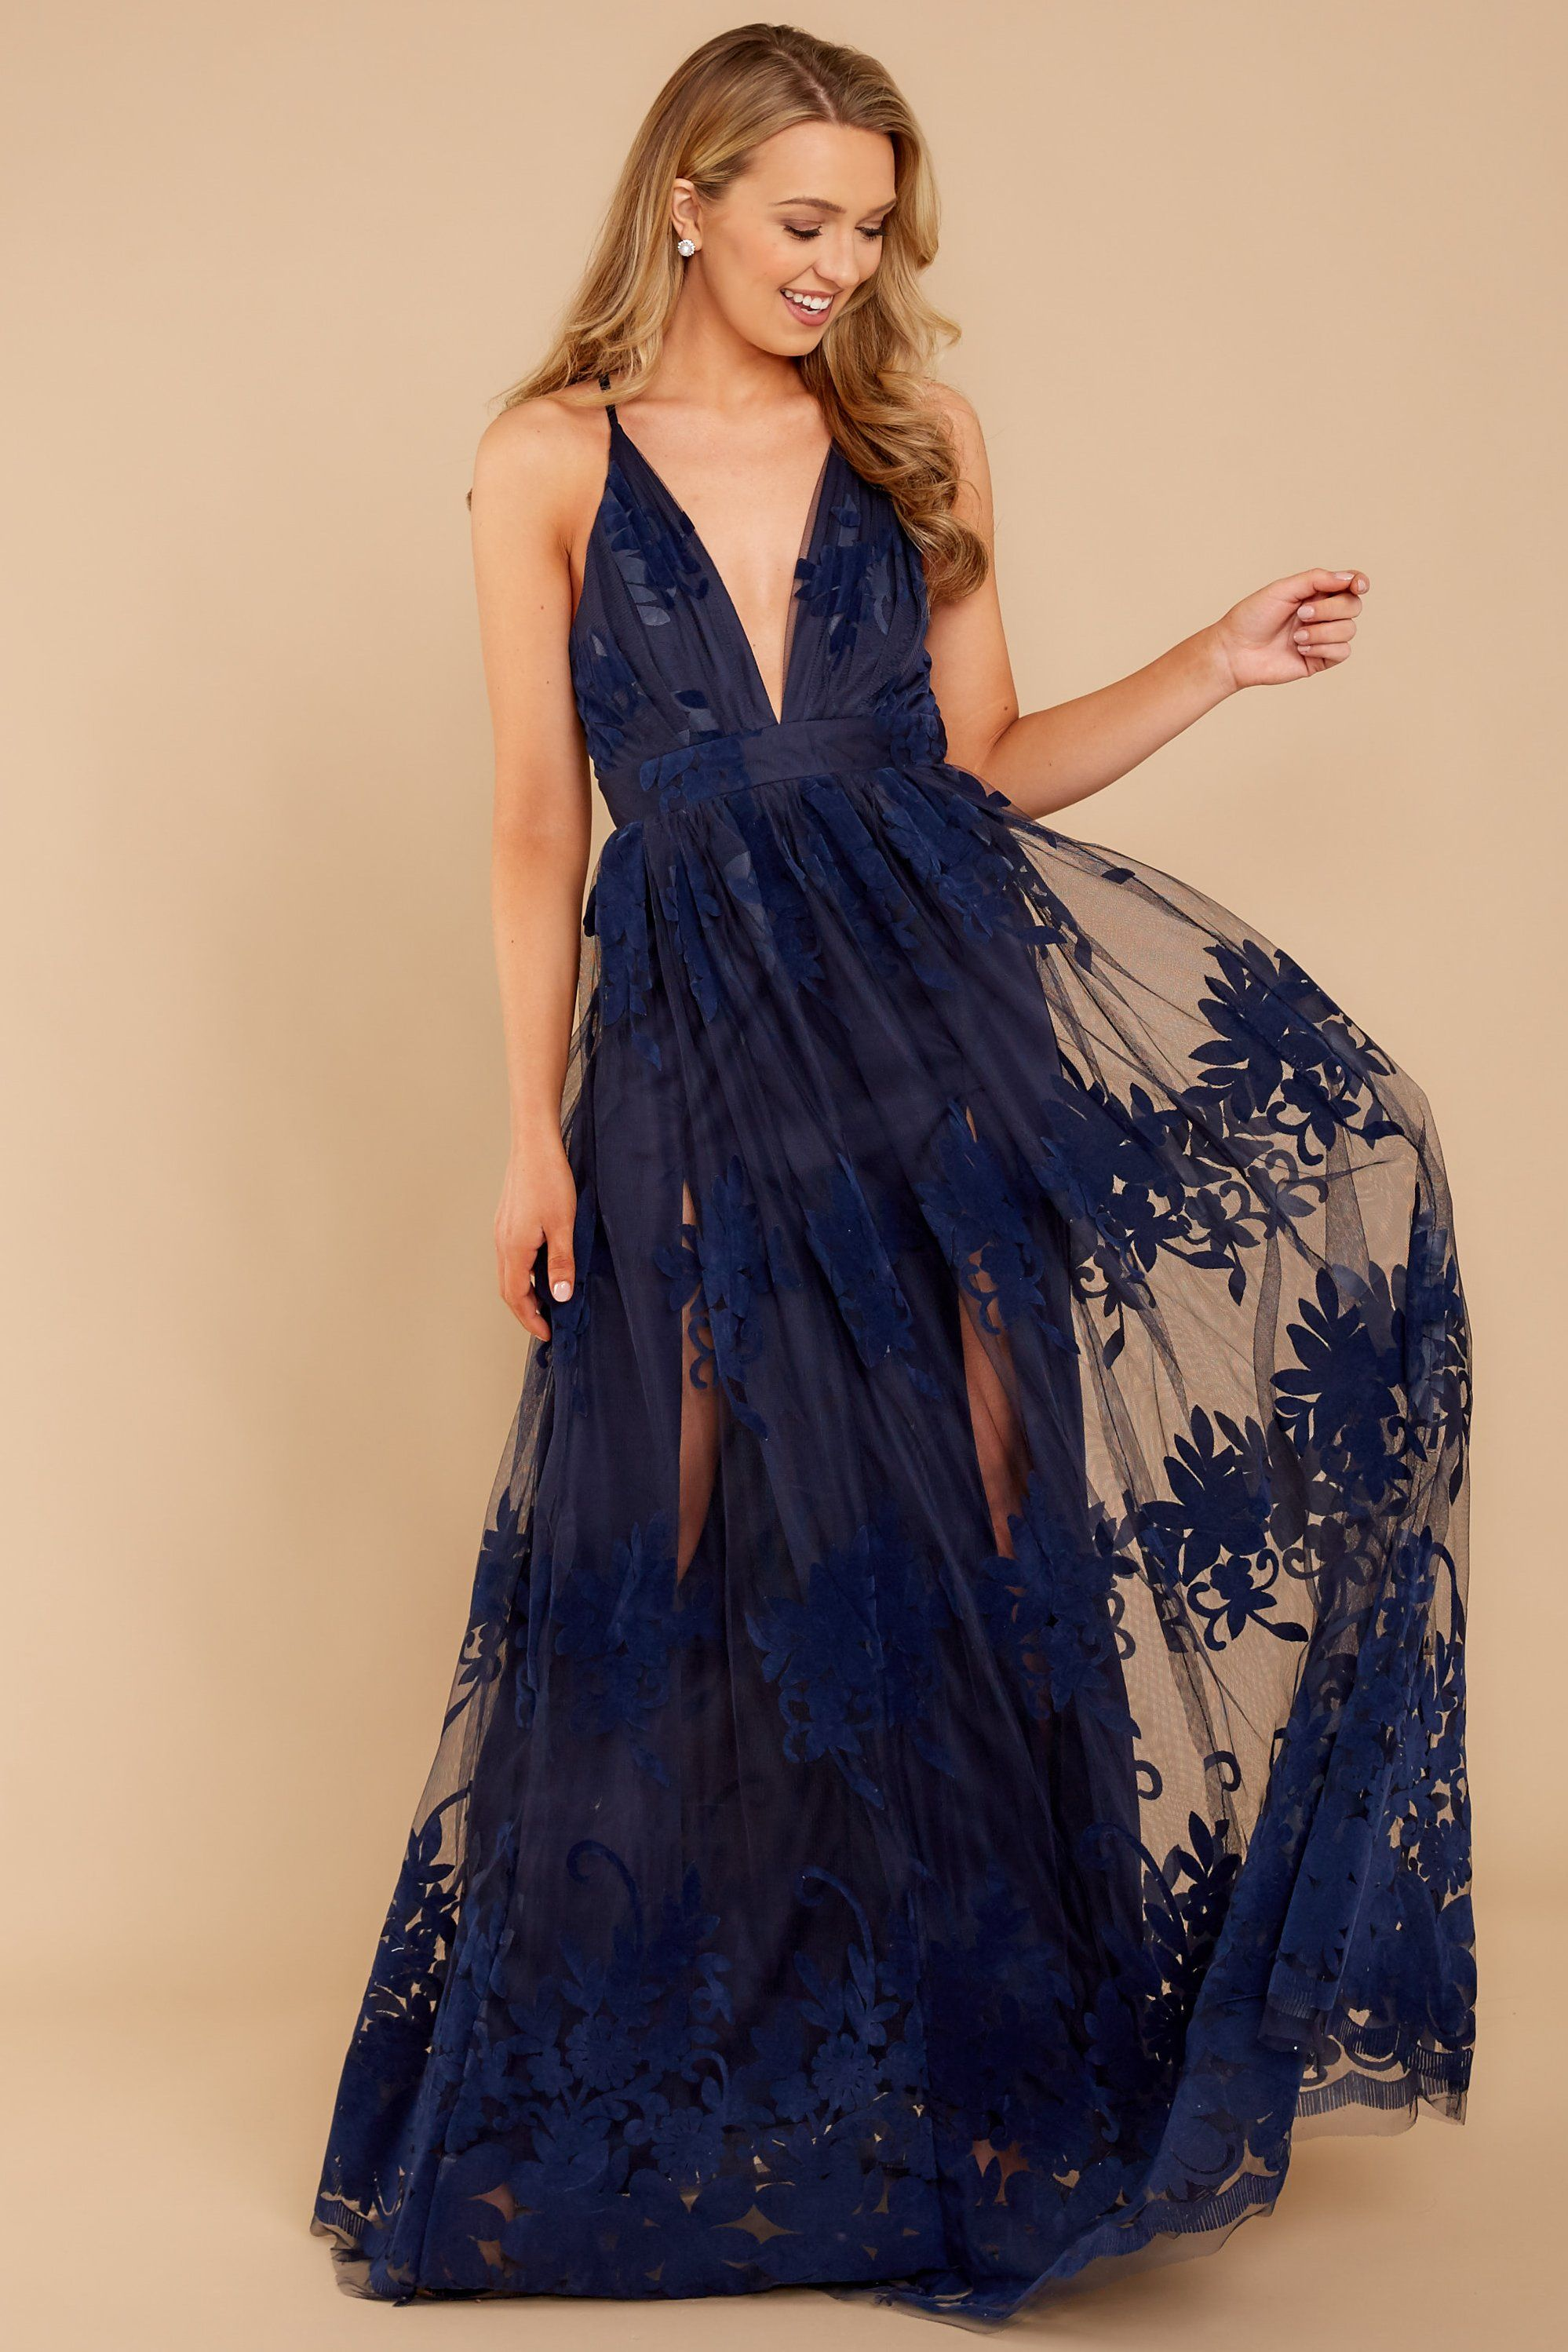 c7c368cbfff45 Gorgeous Navy Maxi Dress - Lace Dress - Formal Dress - $68.00 – Red Dress  Boutique